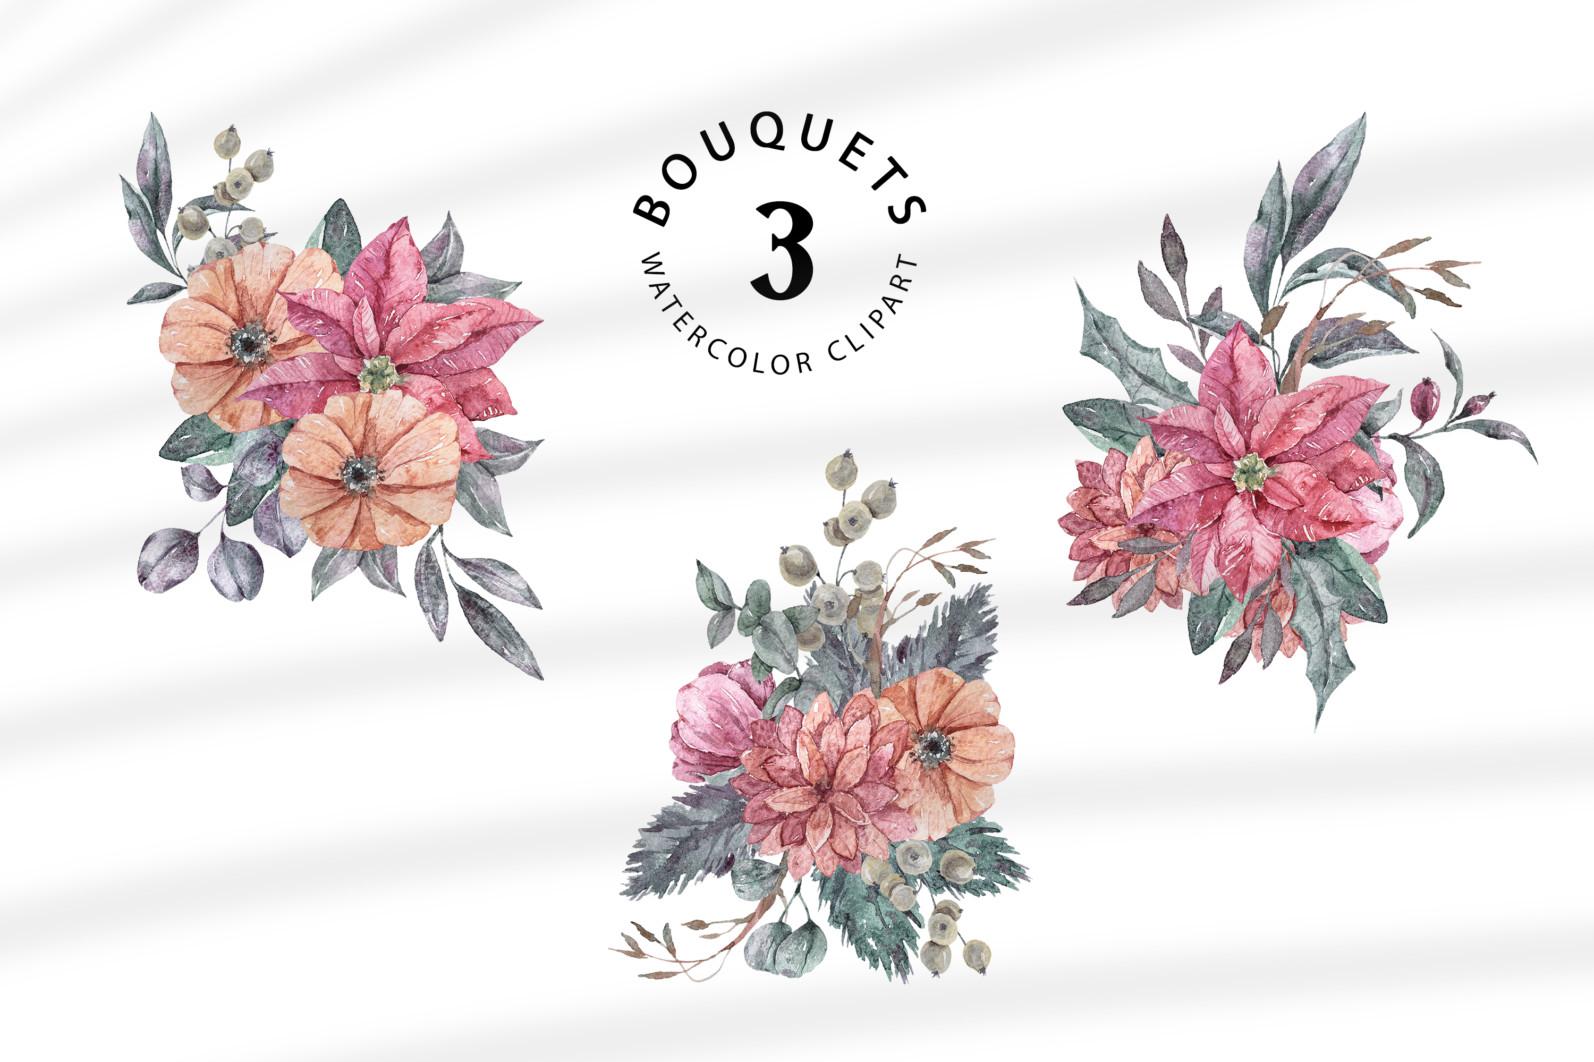 Floral bouquets sublimation / clipart- 3 png files - preview bouquets 1 scaled -